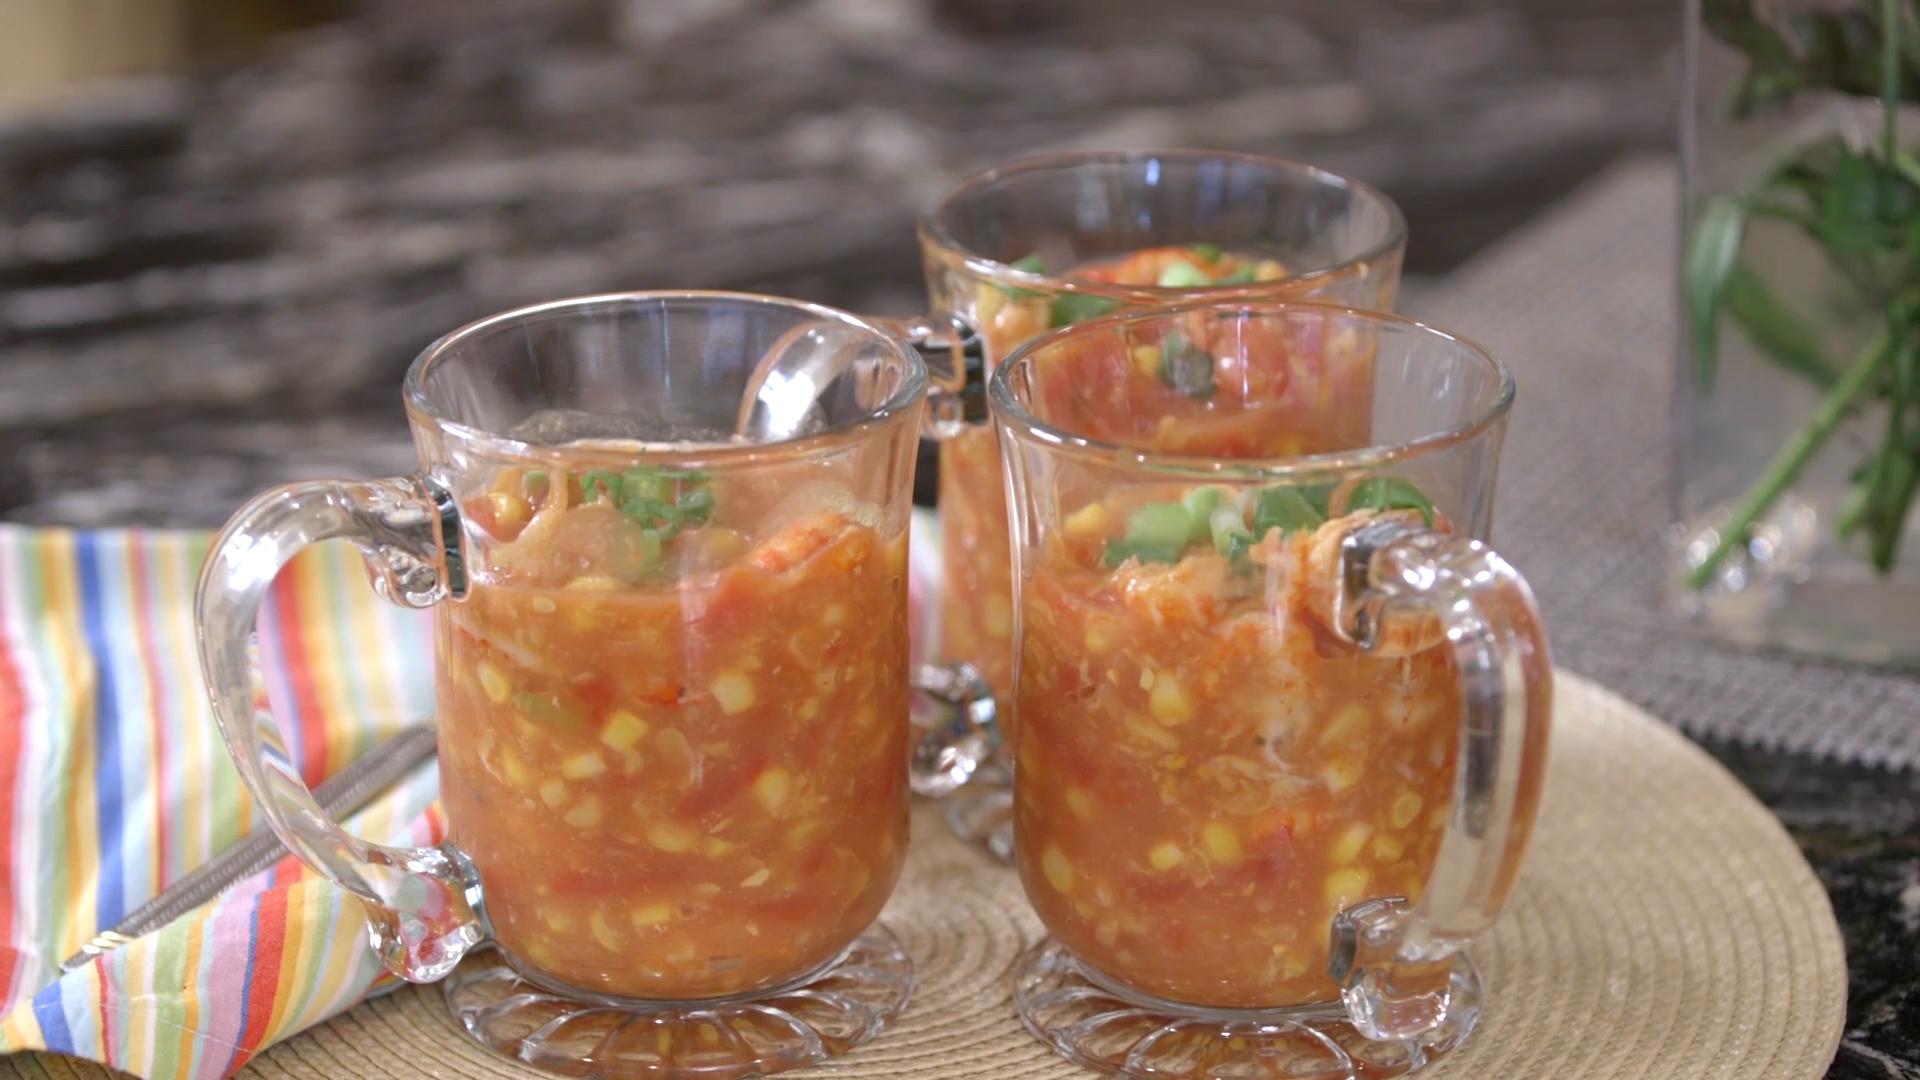 Rush Hour Recipes: Crawfish Corn Soup